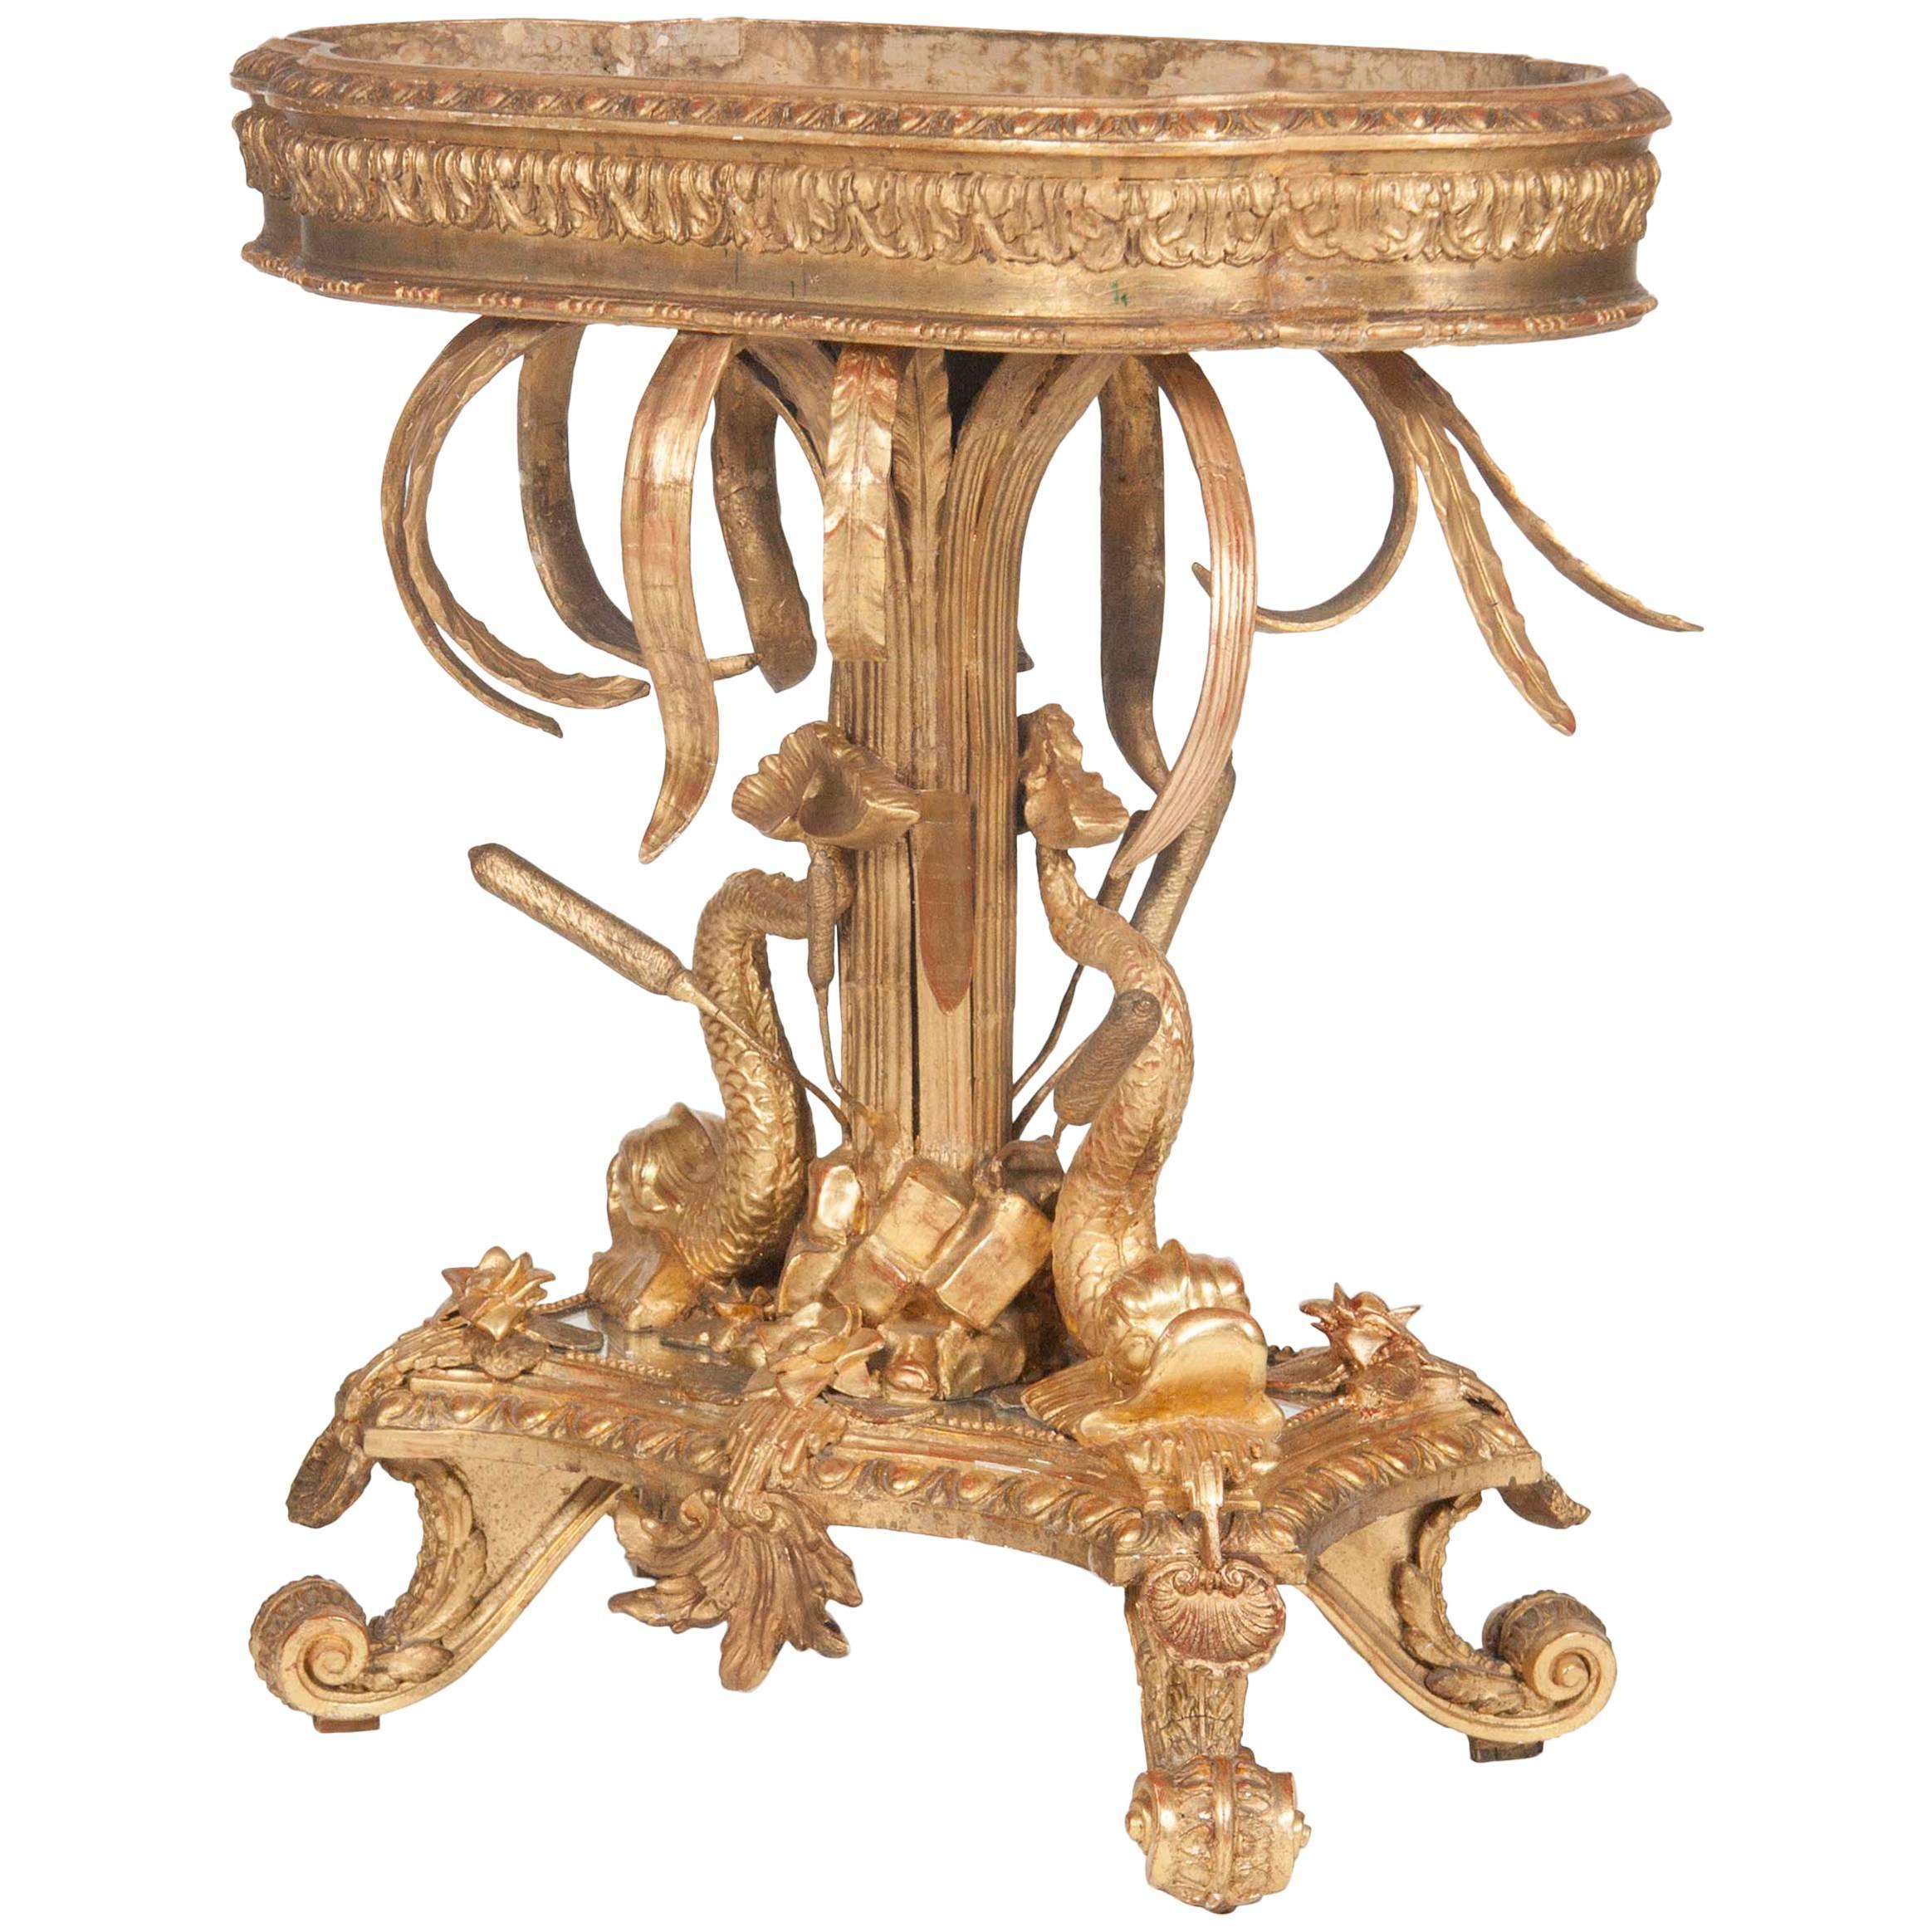 Italian Belle Epoque Gilt Wood Jardiniere with Liner